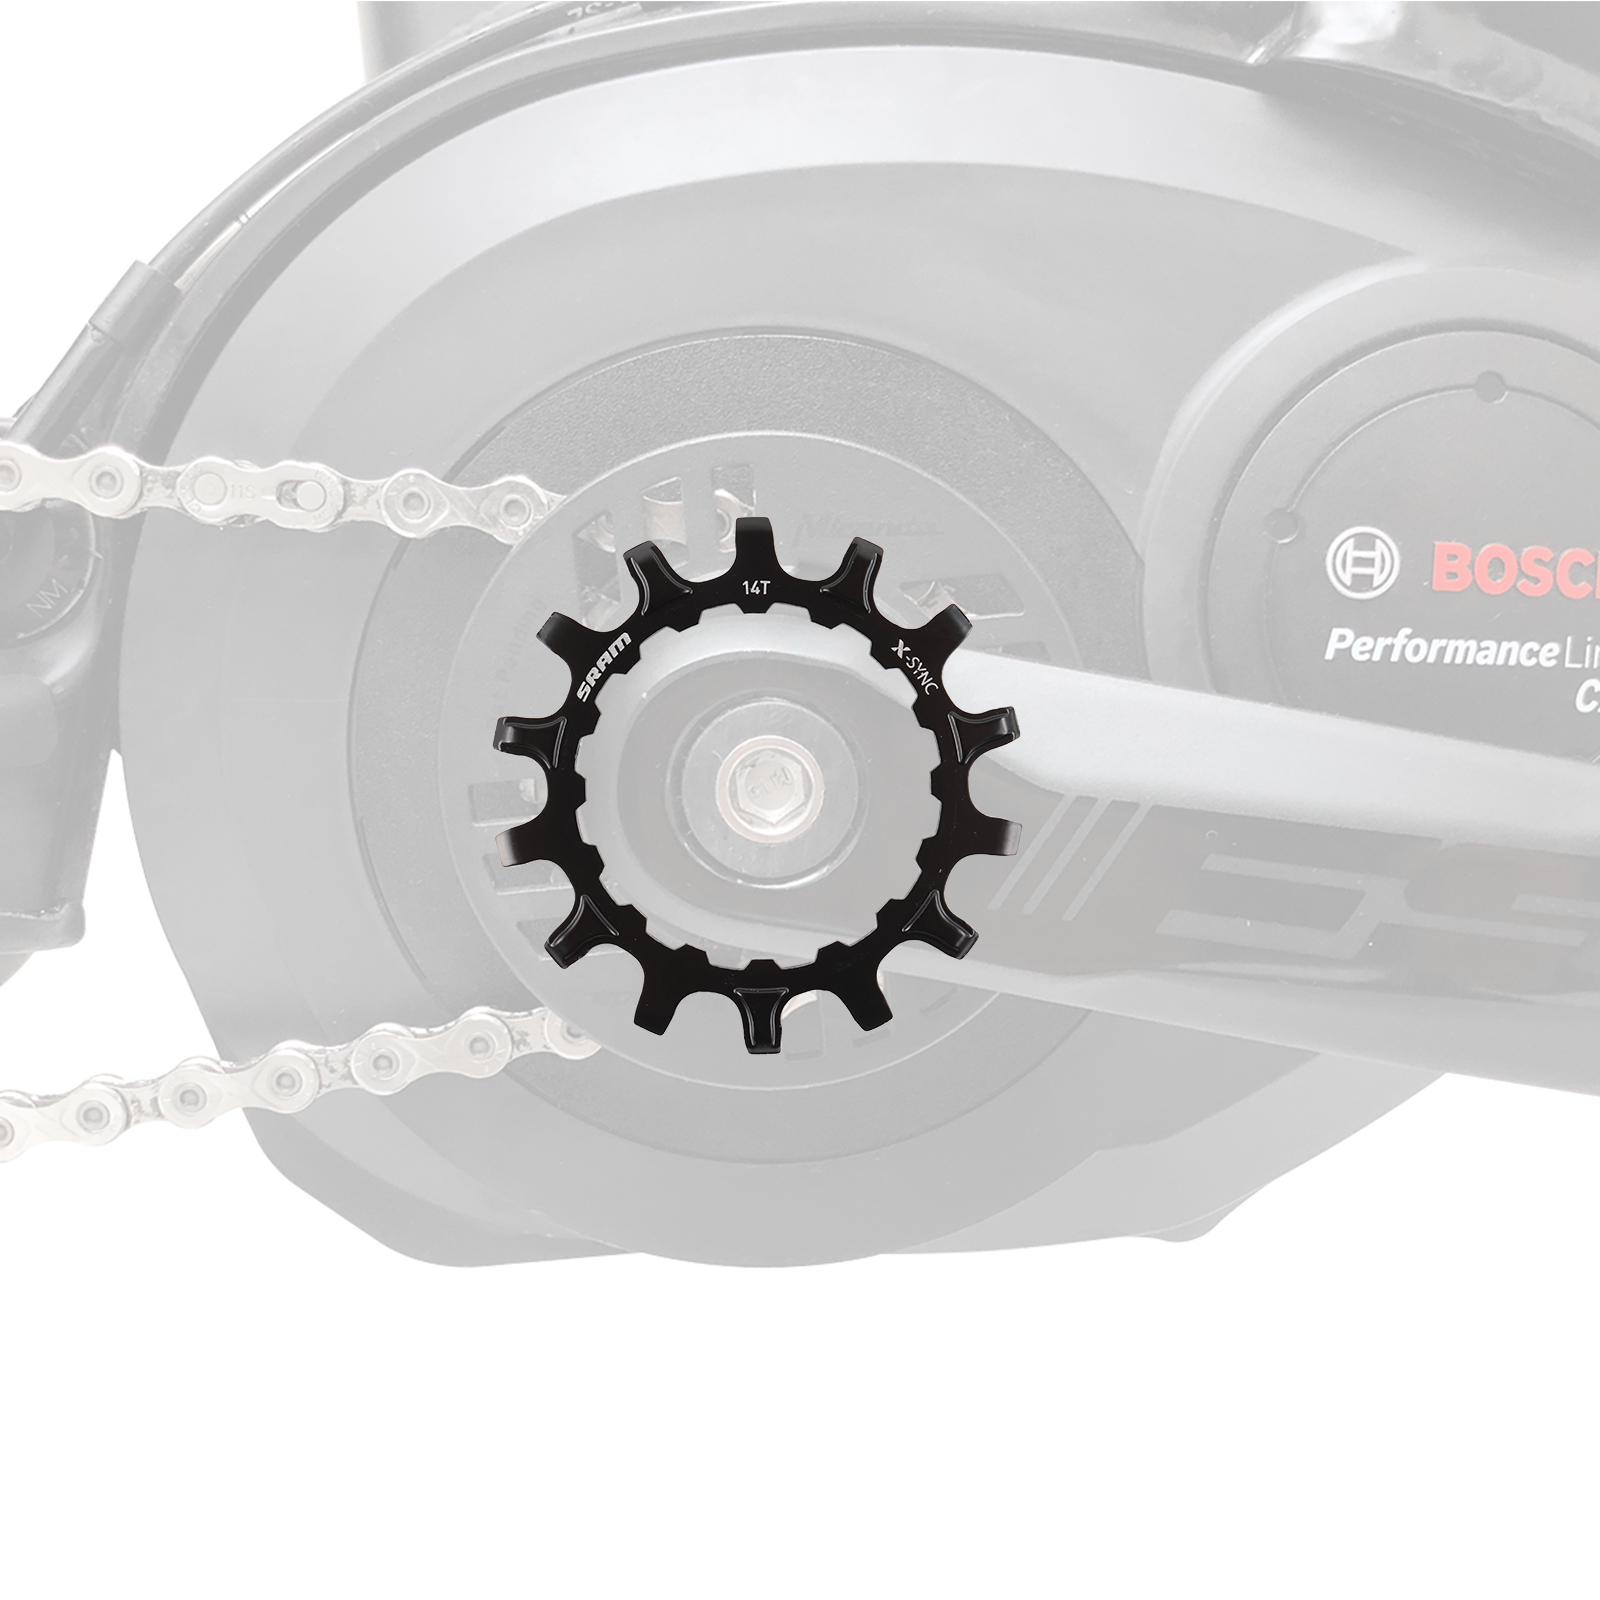 SRAM Kettenblatt 14T EX1 X-Sync™ für Bosch Mittelmotor eBike